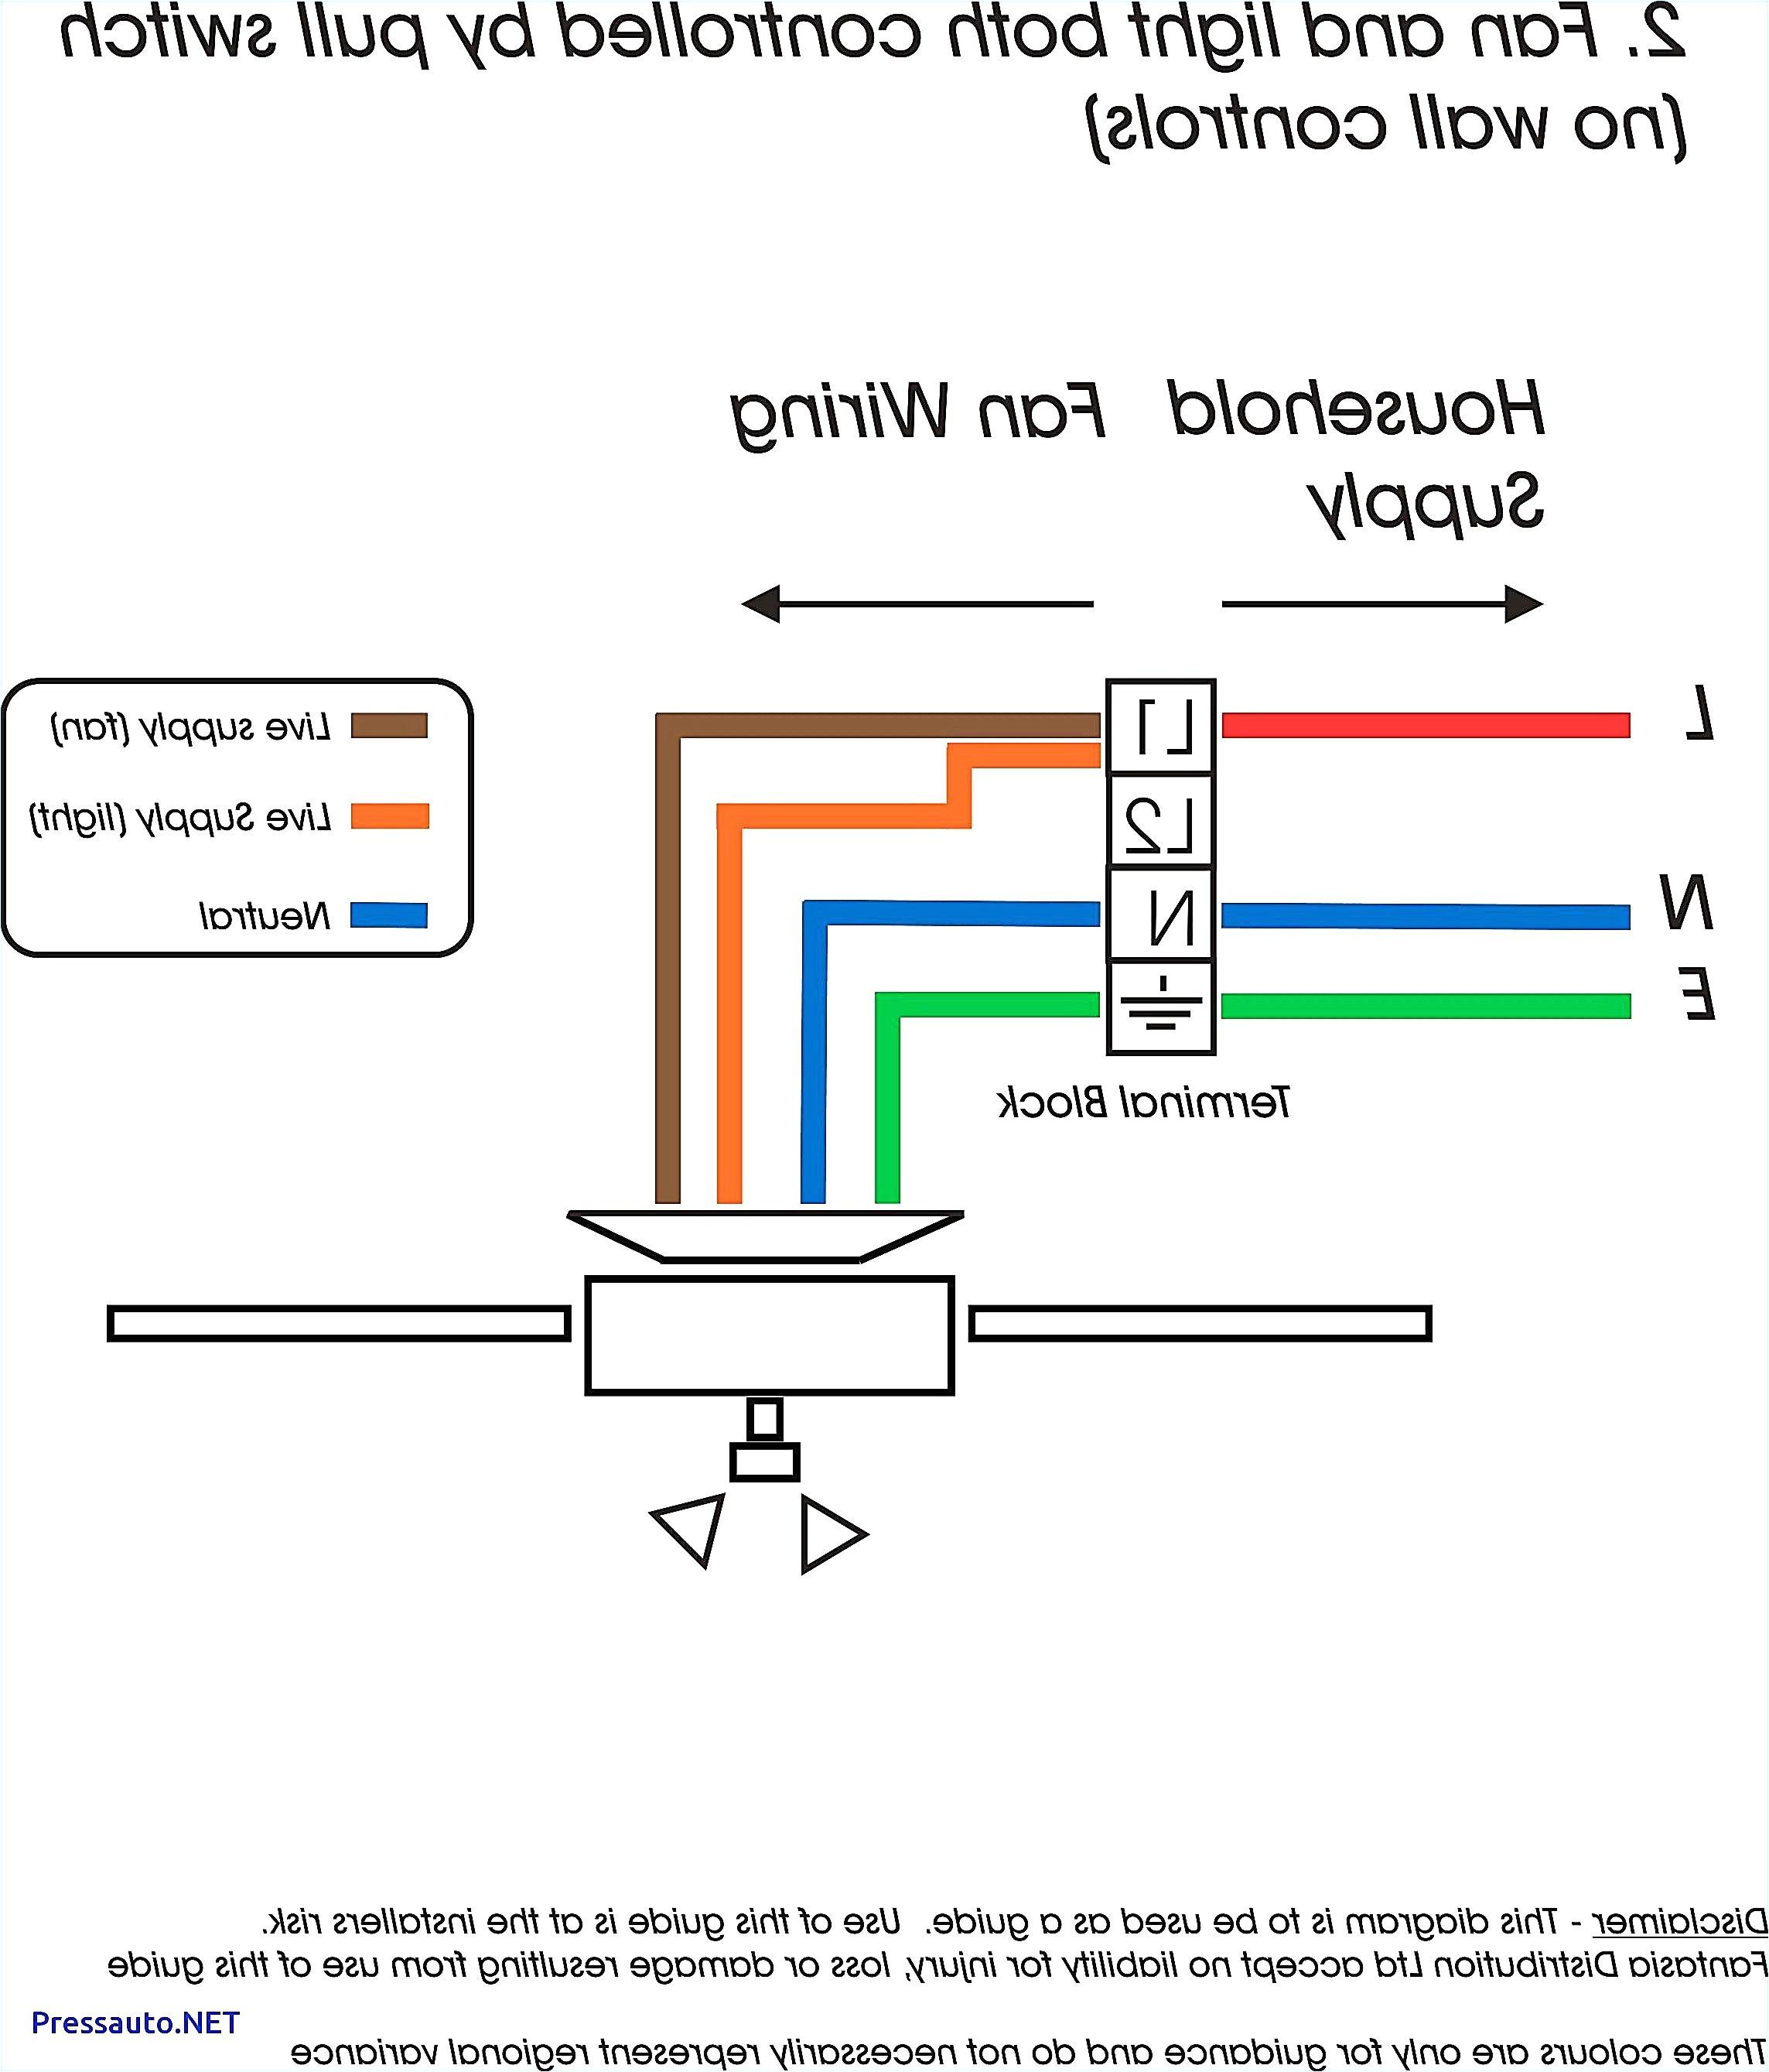 cat 6 wiring diagram unique beautiful cat 6 wiring color code houuzzz of color pictures of cat 6 wiring diagram jpg